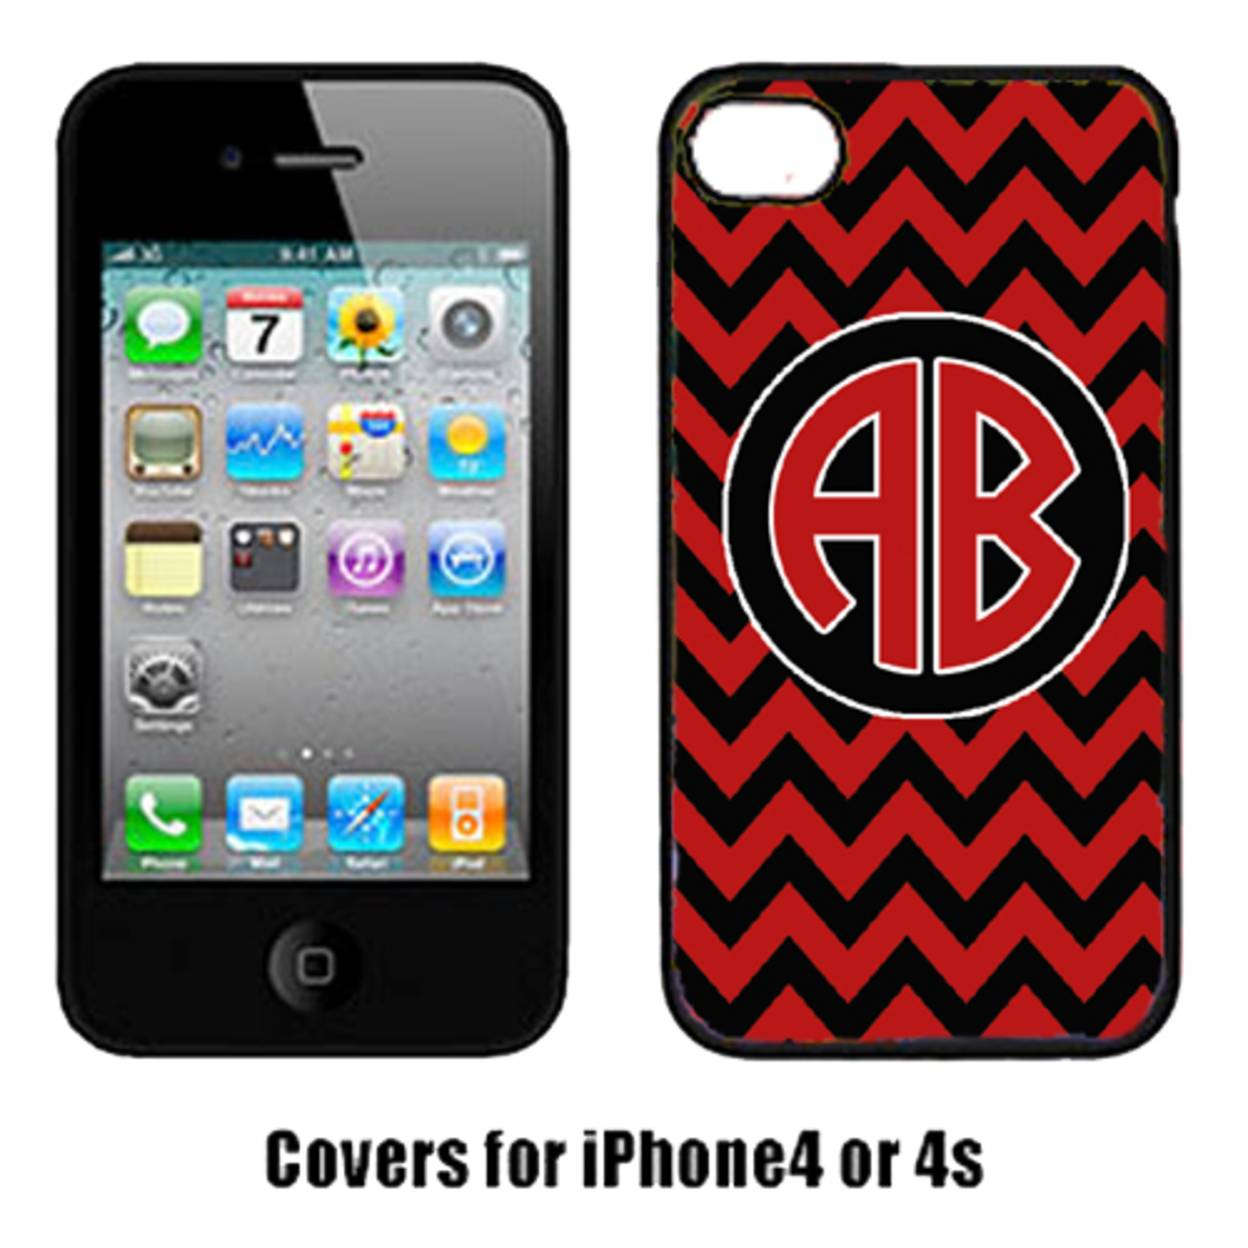 Carolines Treasures CJ1055-CUSTOM-IP4 Chevron Cardinal And White For Arkansas Cell Phone Cover Iphone 4